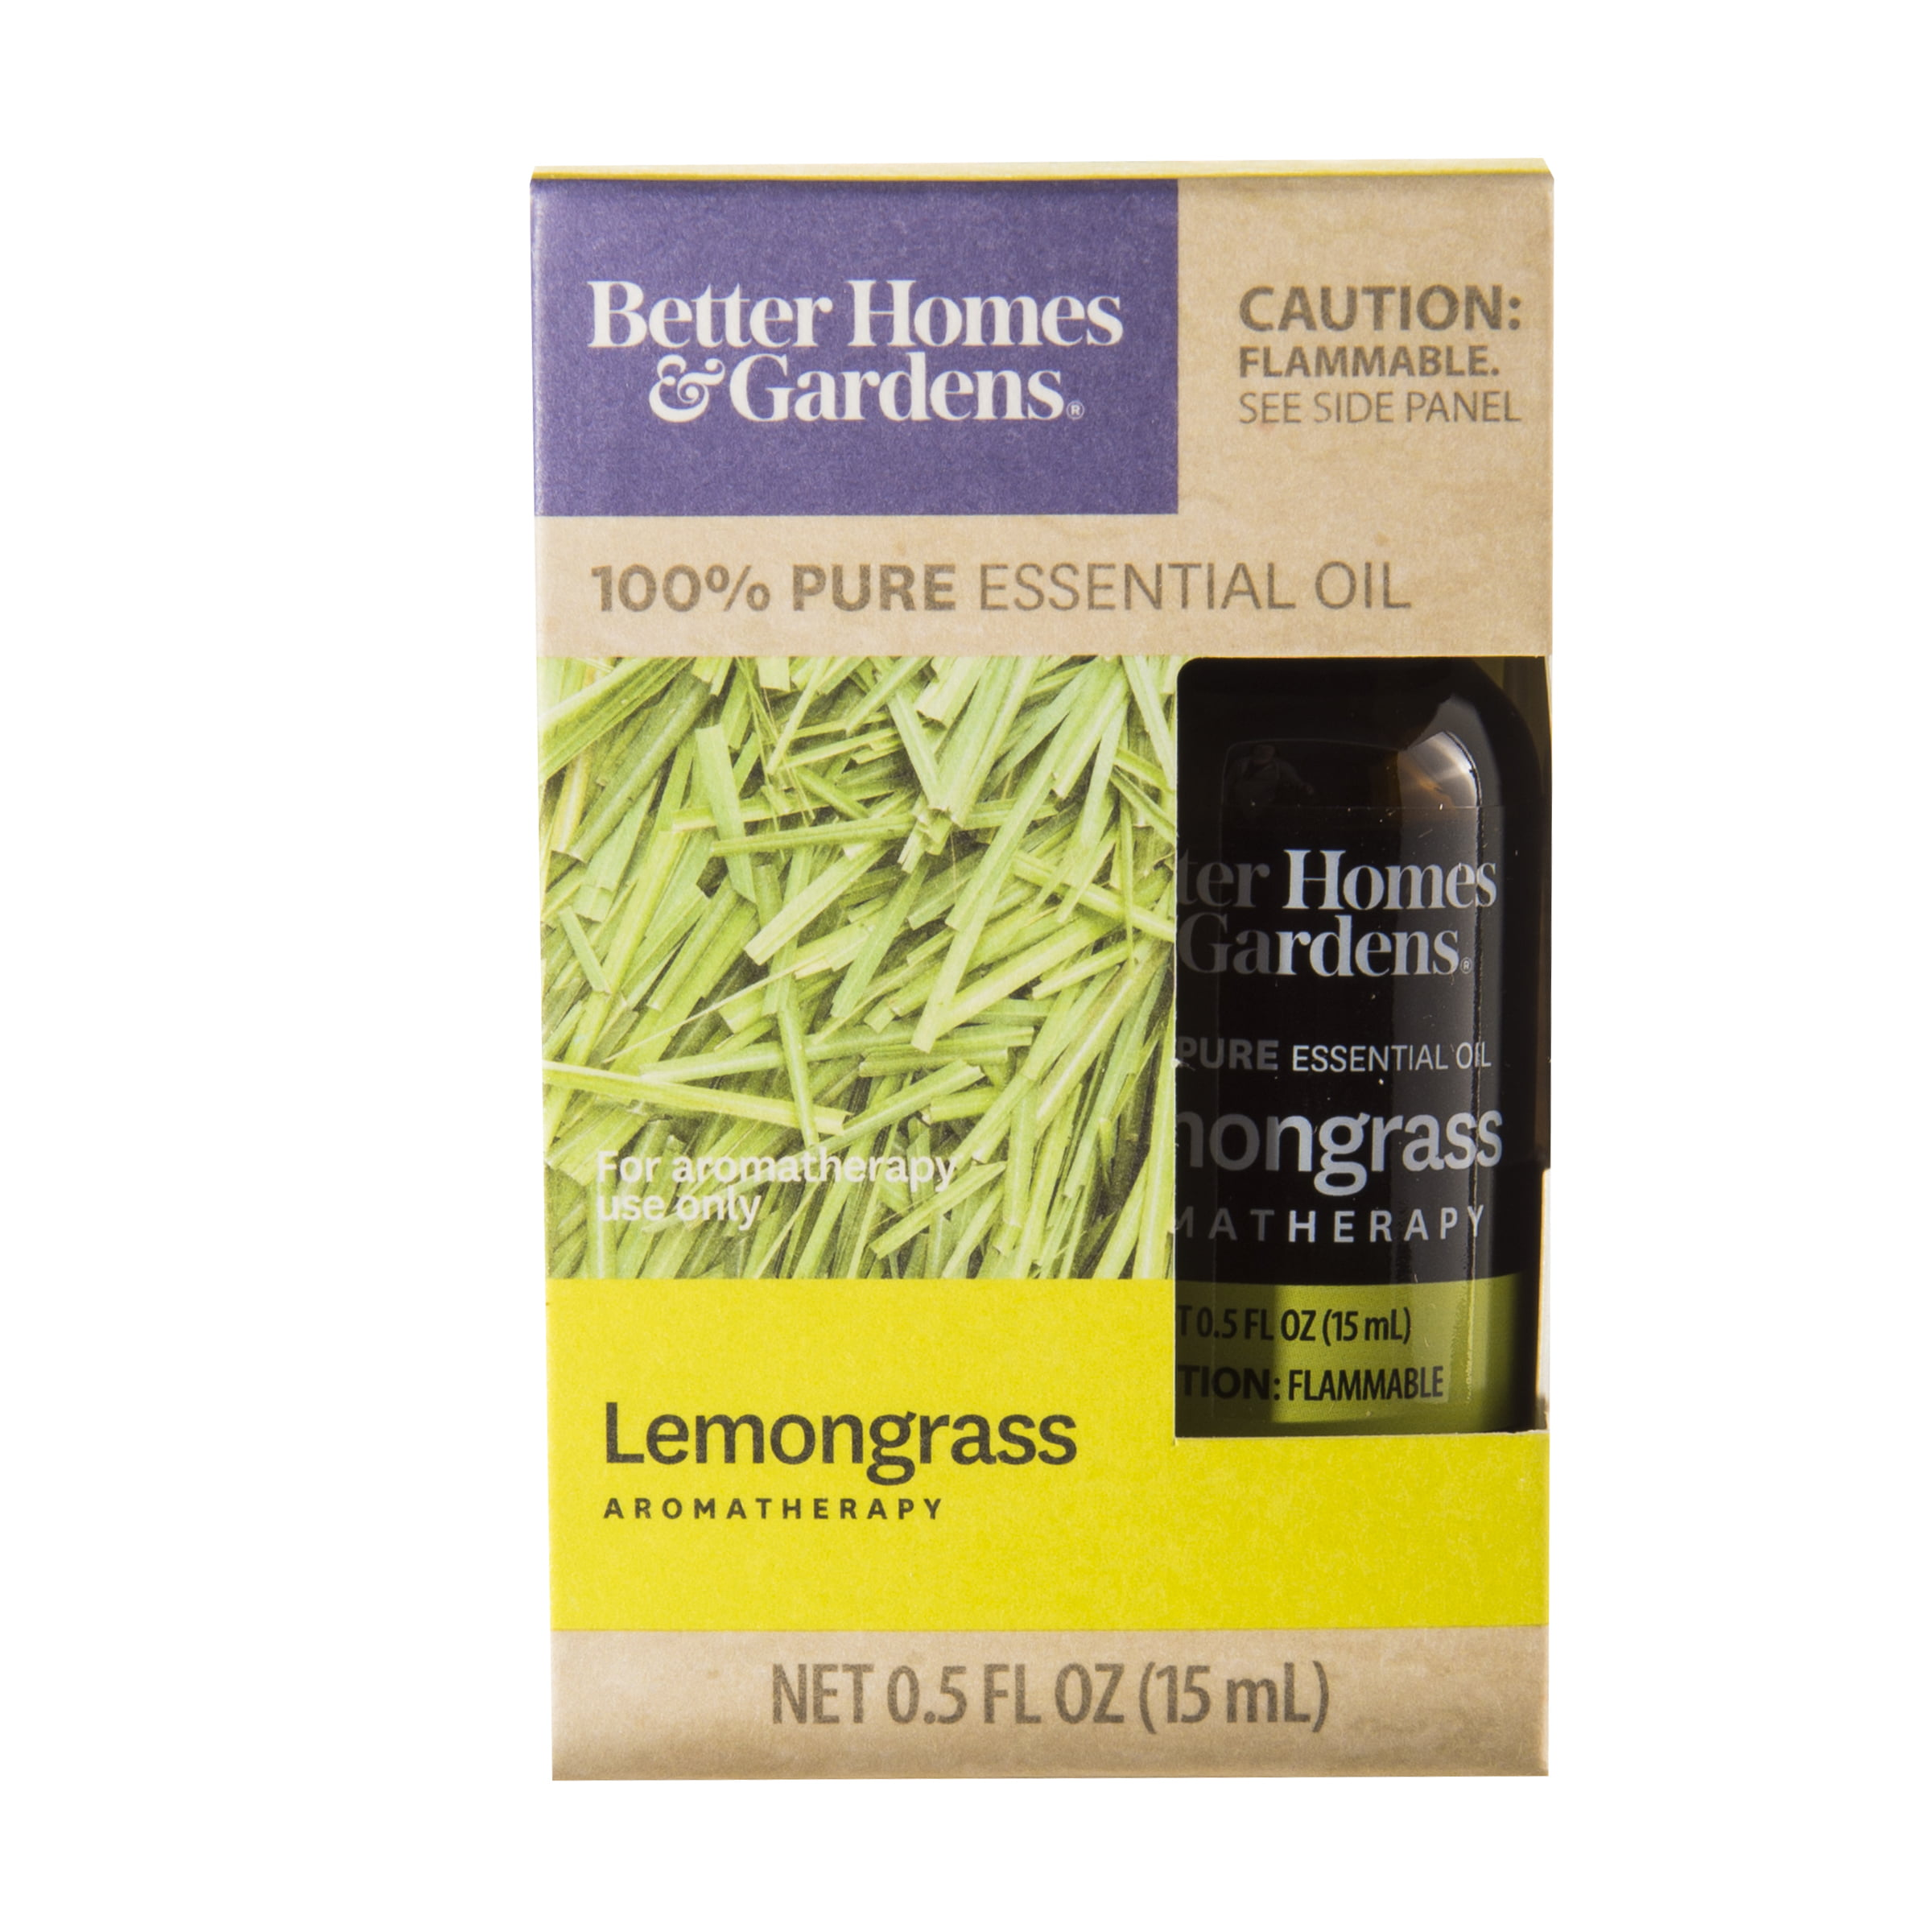 ordinary Lemon Grass Walmart Part - 14: Pure Plant Home 661 Votive Singles 6 Pk Mandarian Orange-Lemongrass Coconut  Wax Votive Singles 6 Pk Mandarian Orange-Lemongrass - Walmart.com